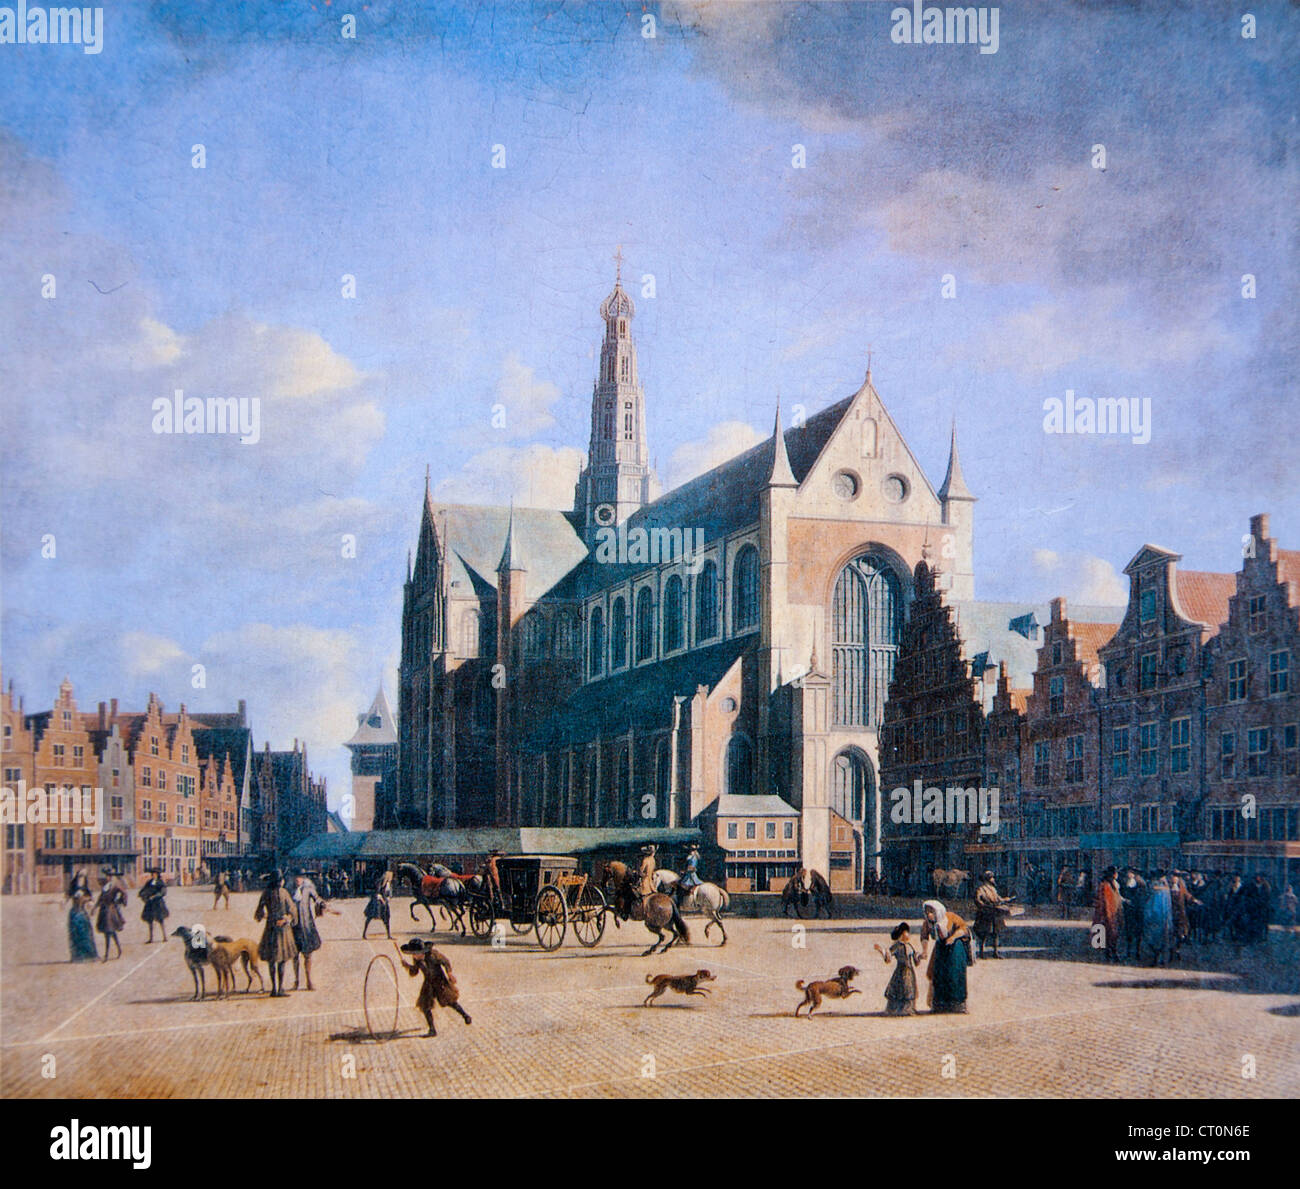 Gerrit Berckheyde, The Grote Markt and St. Bavokerk, 1696. Stock Photo